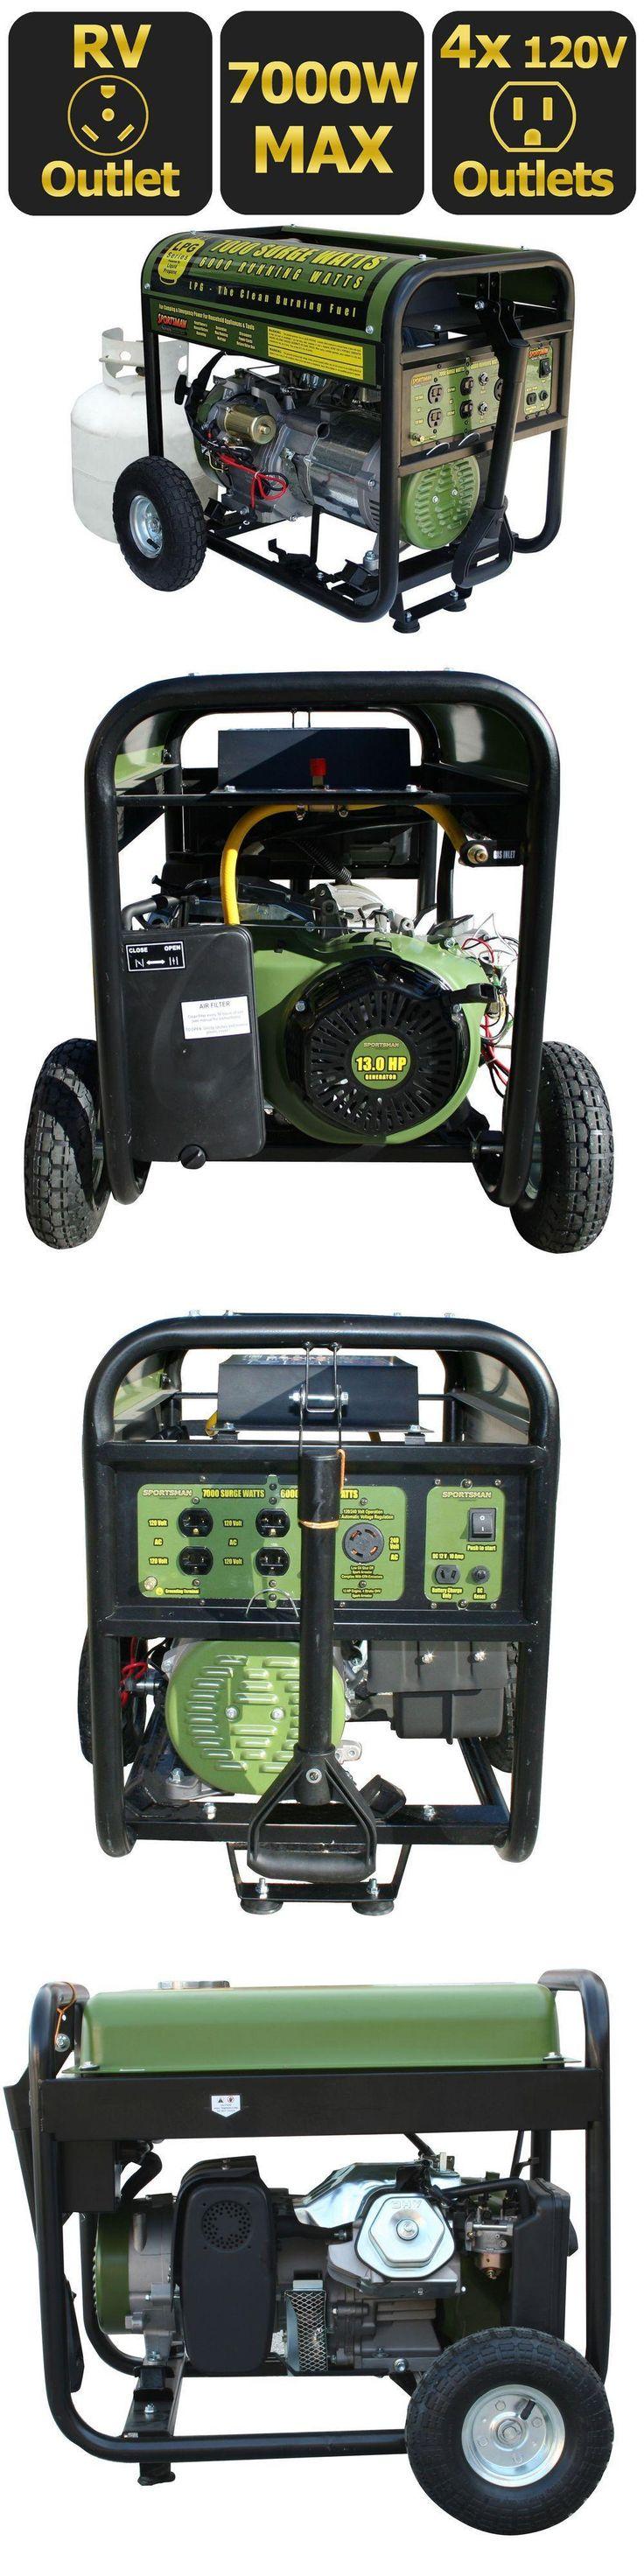 Generators 33082: New Sportsman 7,000-Watt Generator Lpg Propane Gas Powered Electric Portable Nib -> BUY IT NOW ONLY: $893.98 on eBay!